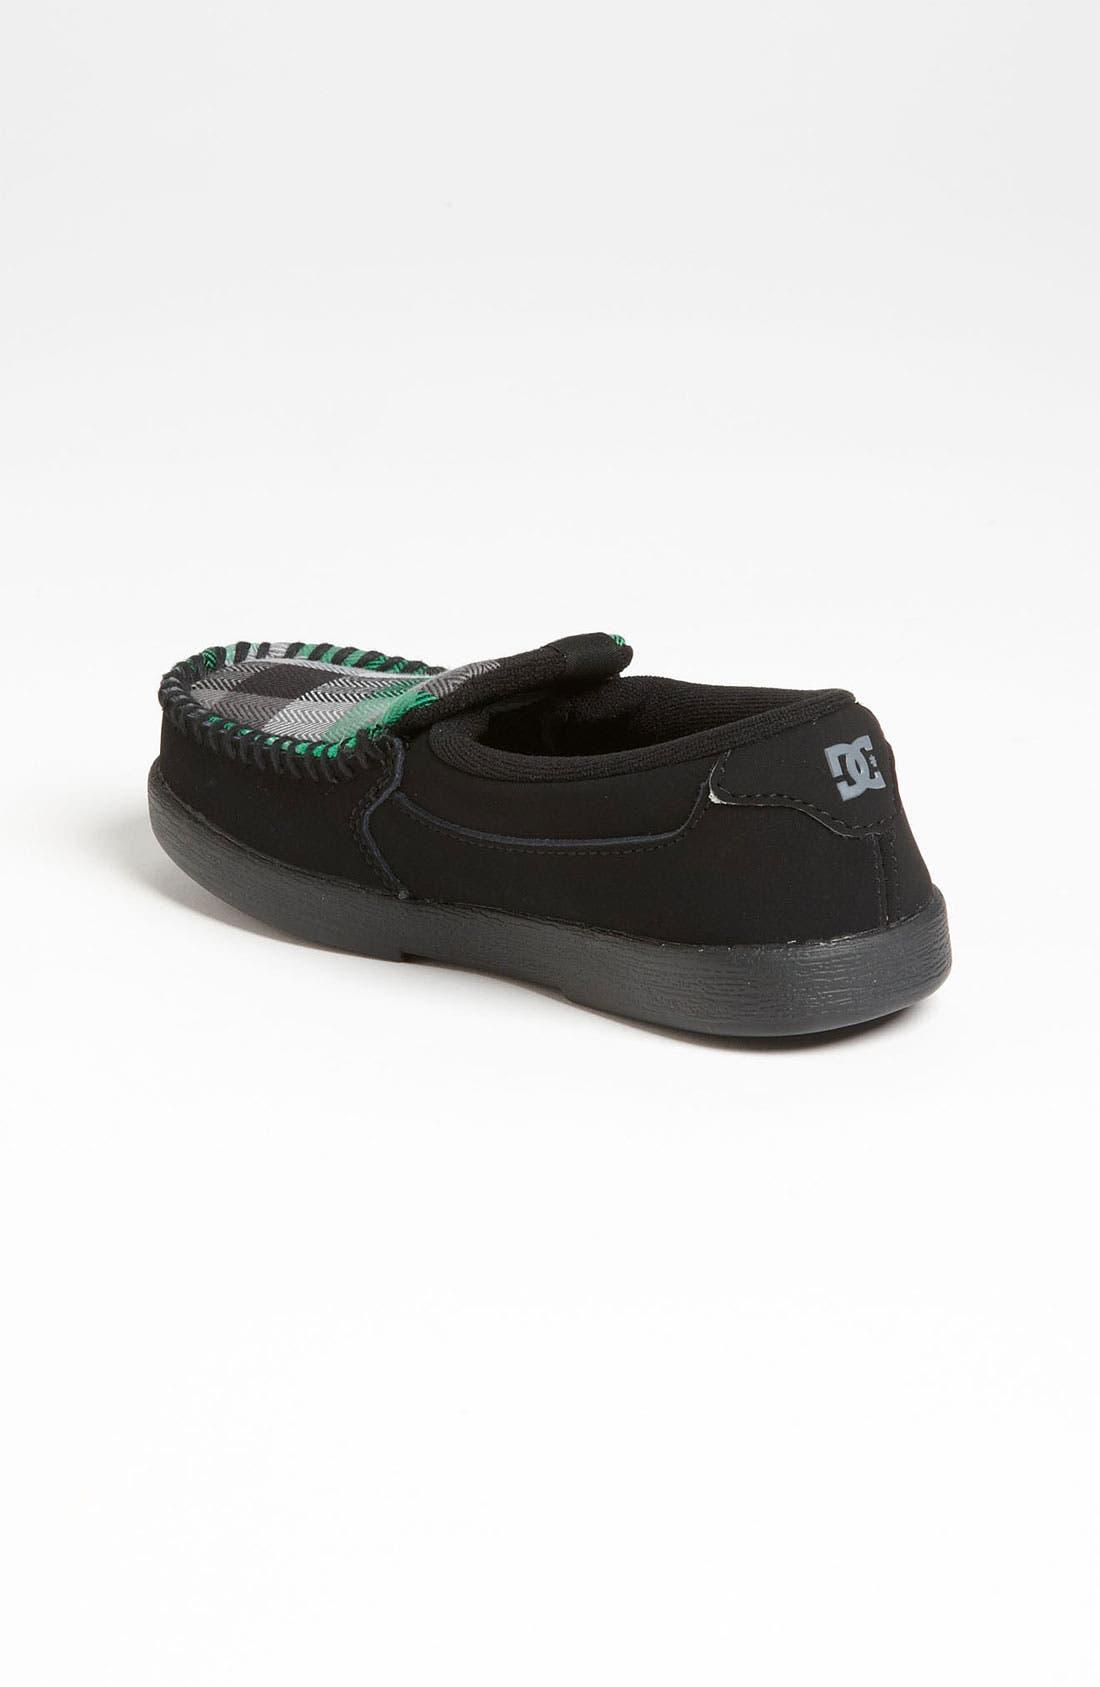 Alternate Image 2  - DC Shoes 'Villain' Slip-On (Walker, Toddler, Little Kid & Big Kid)